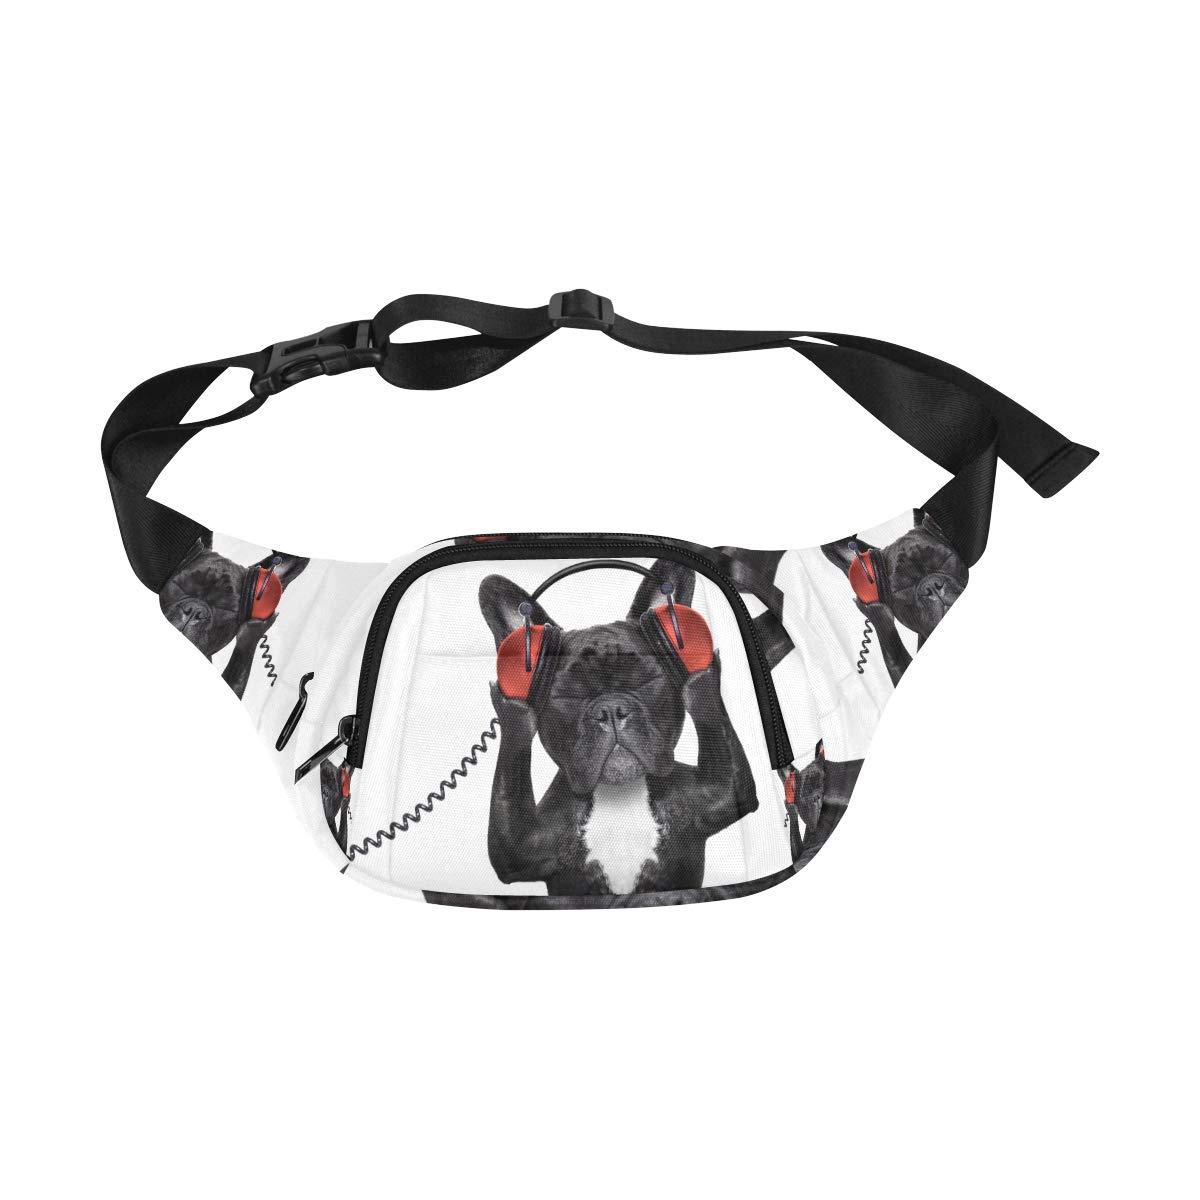 Happy Animal Dog Enjoy Music Fenny Packs Waist Bags Adjustable Belt Waterproof Nylon Travel Running Sport Vacation Party For Men Women Boys Girls Kids